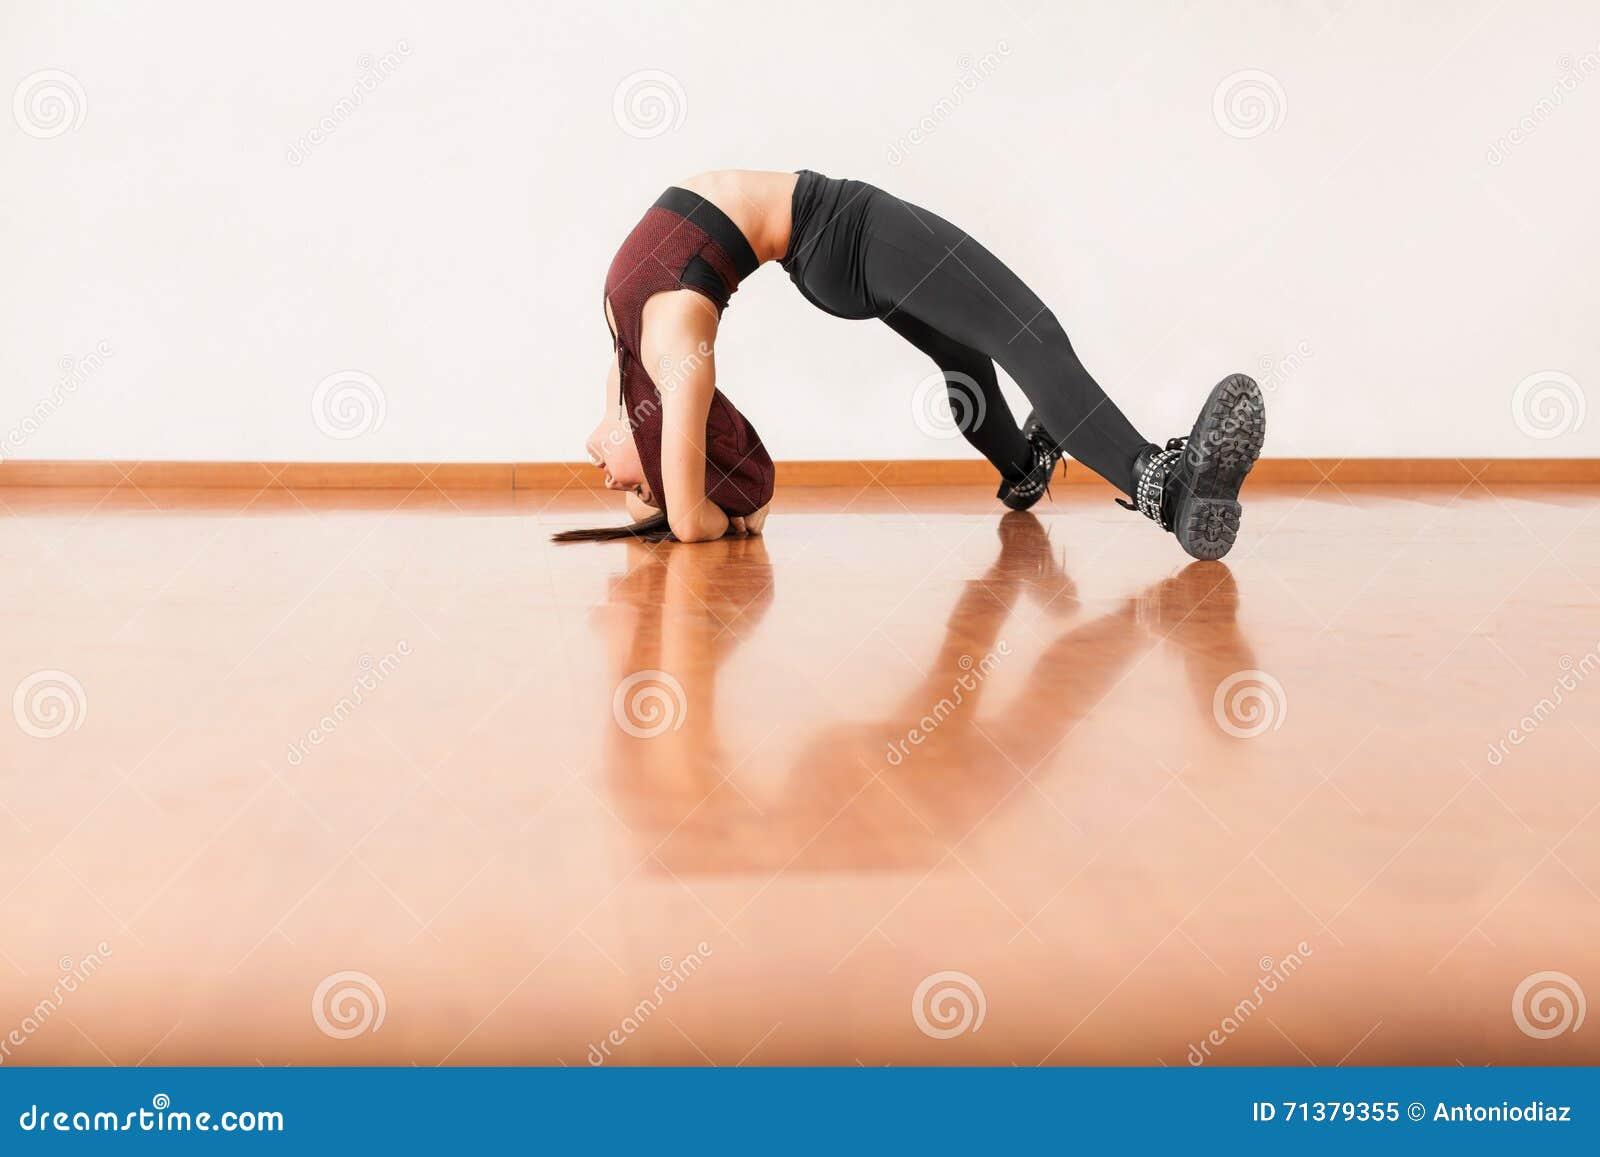 Flexible dancer stock photo. Image of adult, full